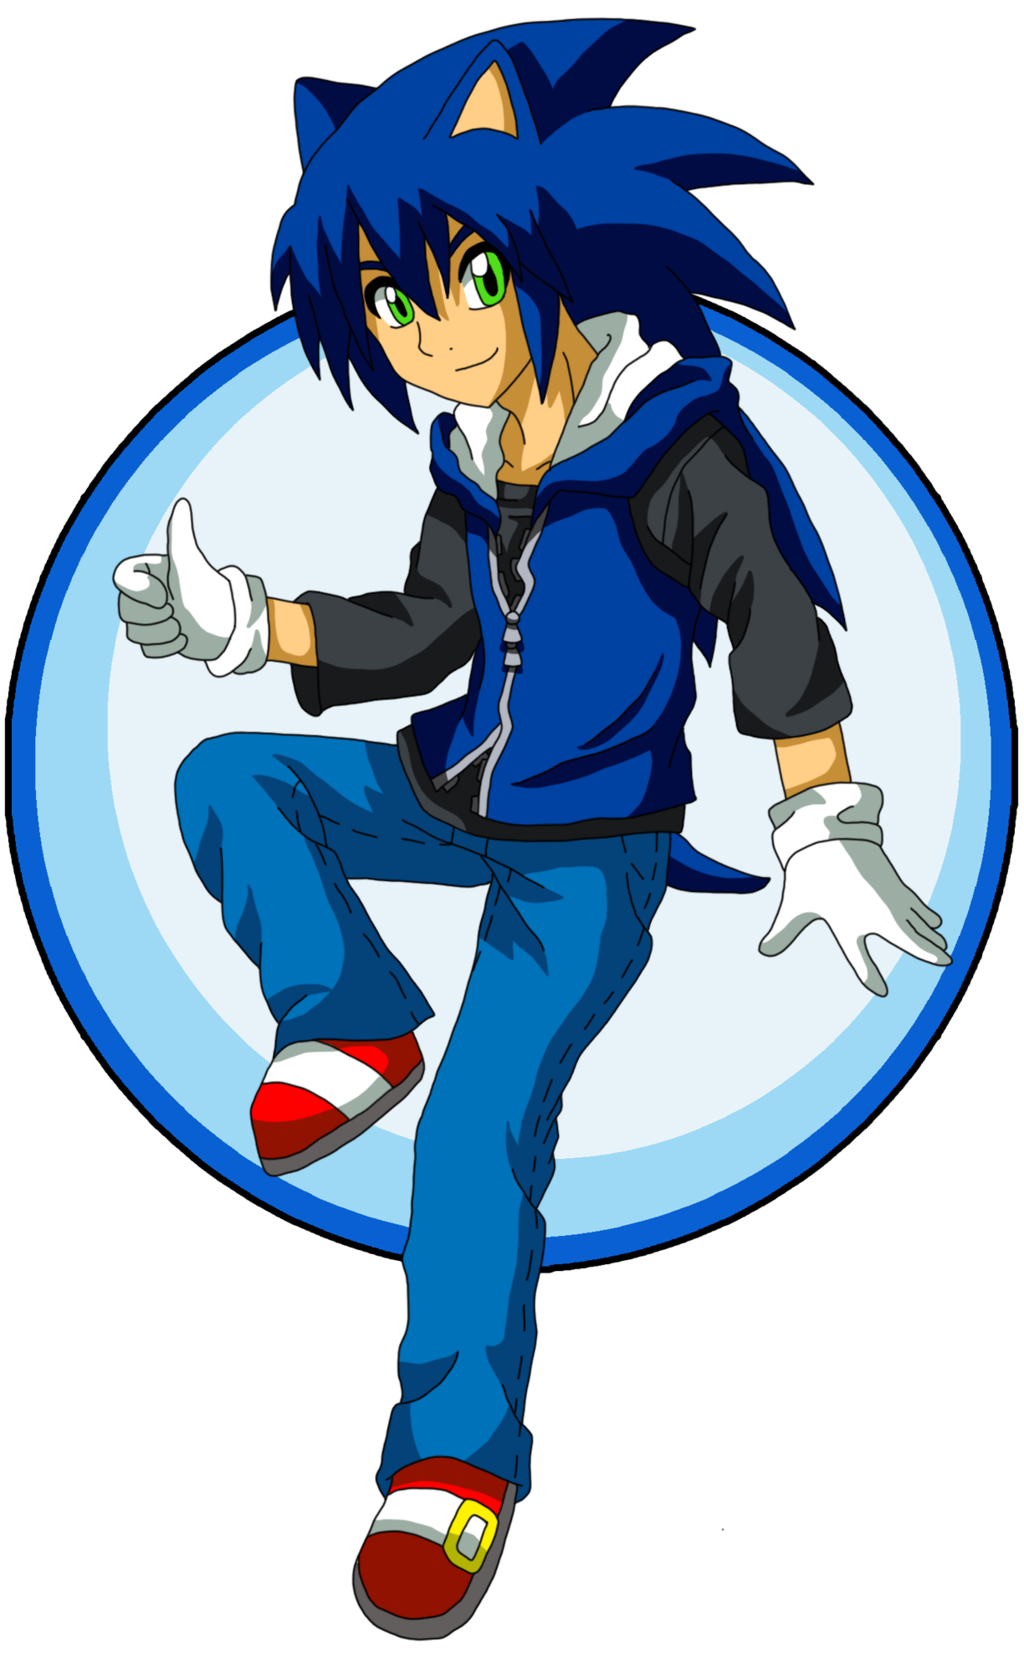 Sonic The Hedgehog Human Pokemon Personajes Personajes De Videojuegos Sonic Dibujos